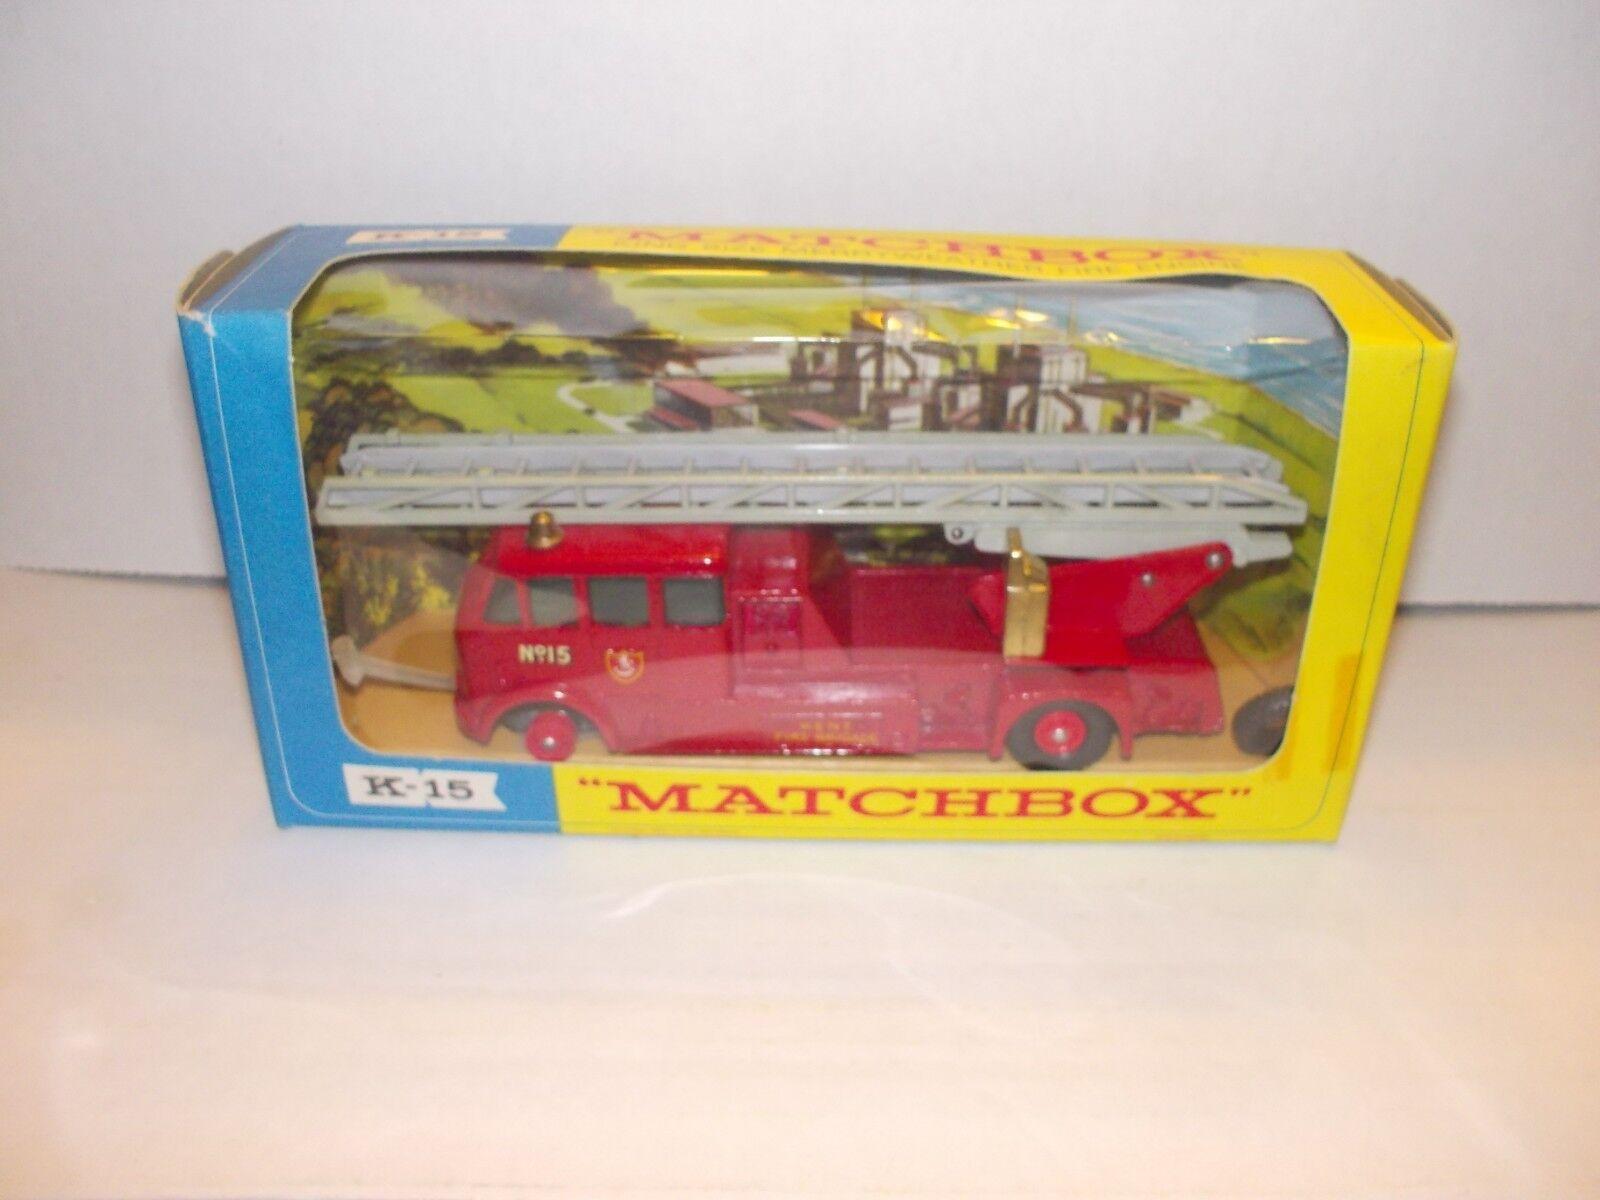 Vintage Matchscatola re Dimensione Jumbo Merryweather Fire Engine NIB K15 K-15 w  scatola